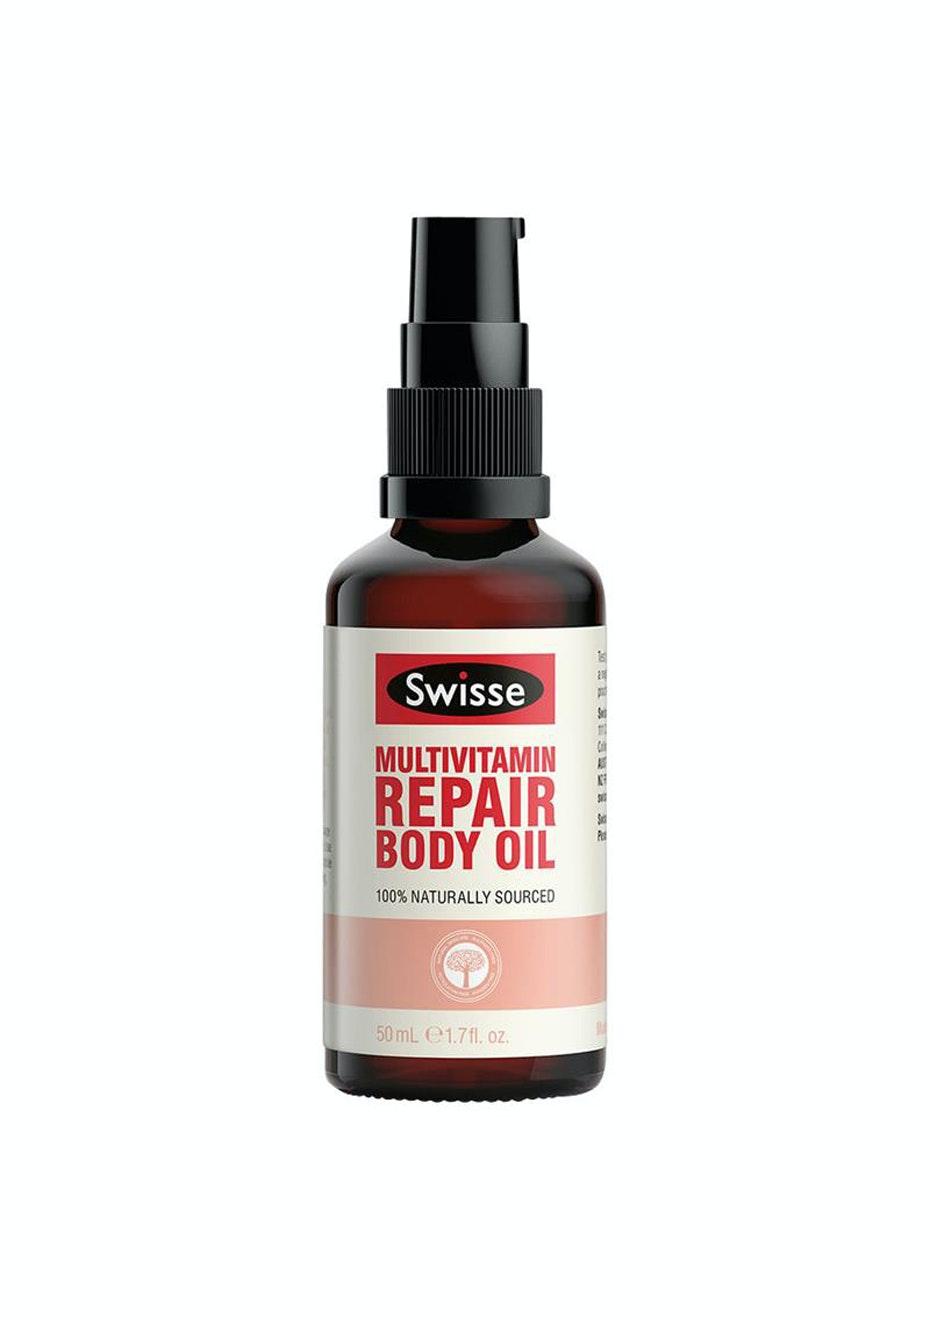 Swissee Multivitamin Repair Body Oil 50Ml